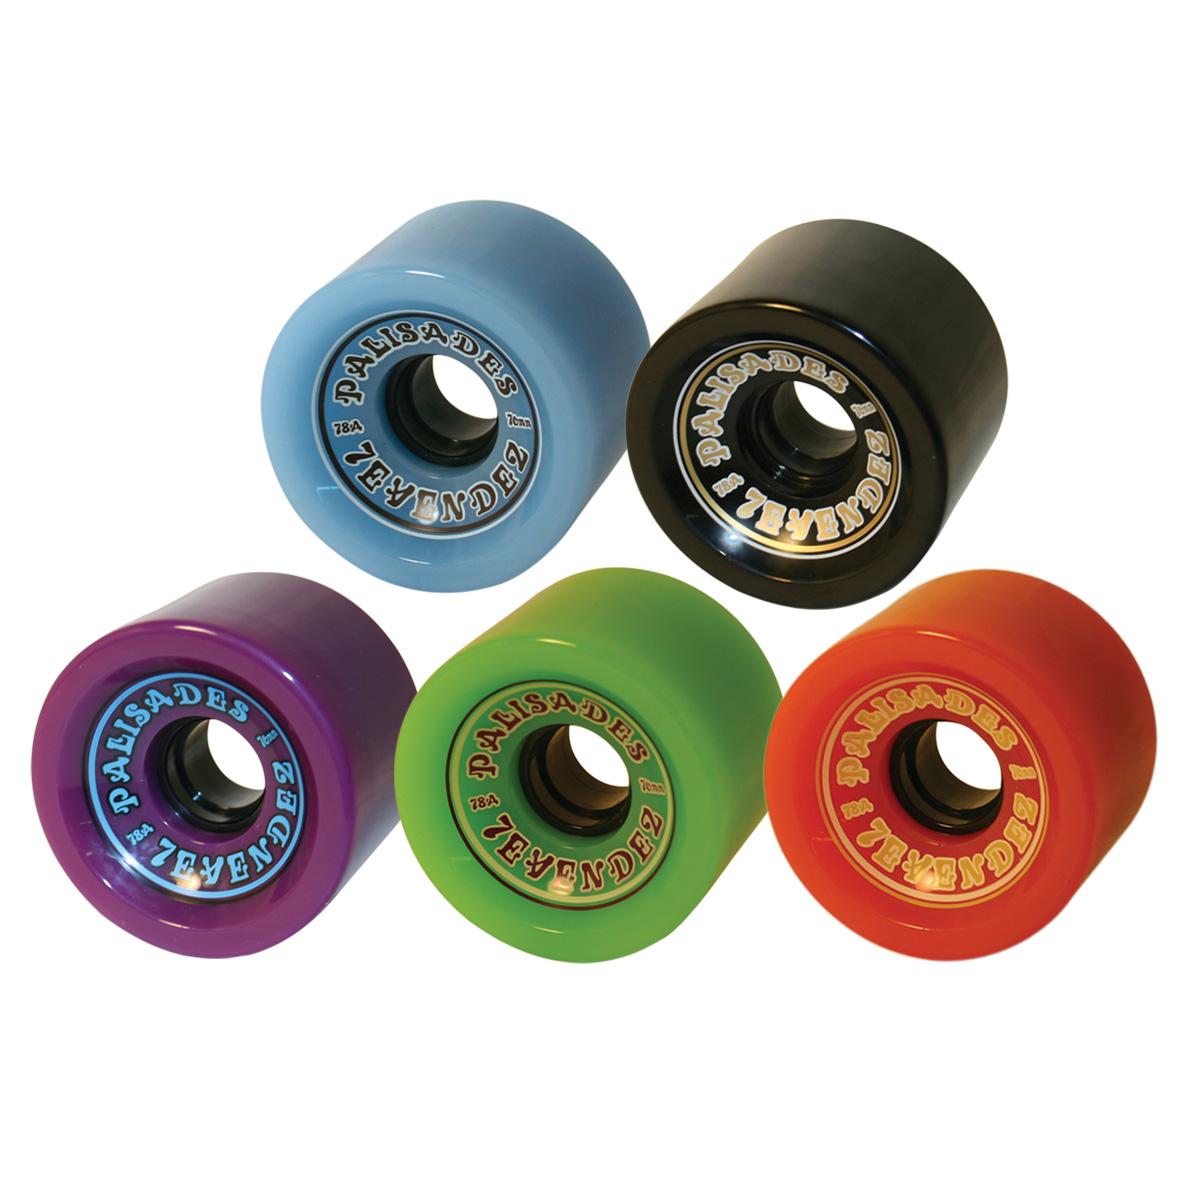 7evendez - 70mm Wheels  78A w/hub. Blue, Black, Purple, Green, Orange